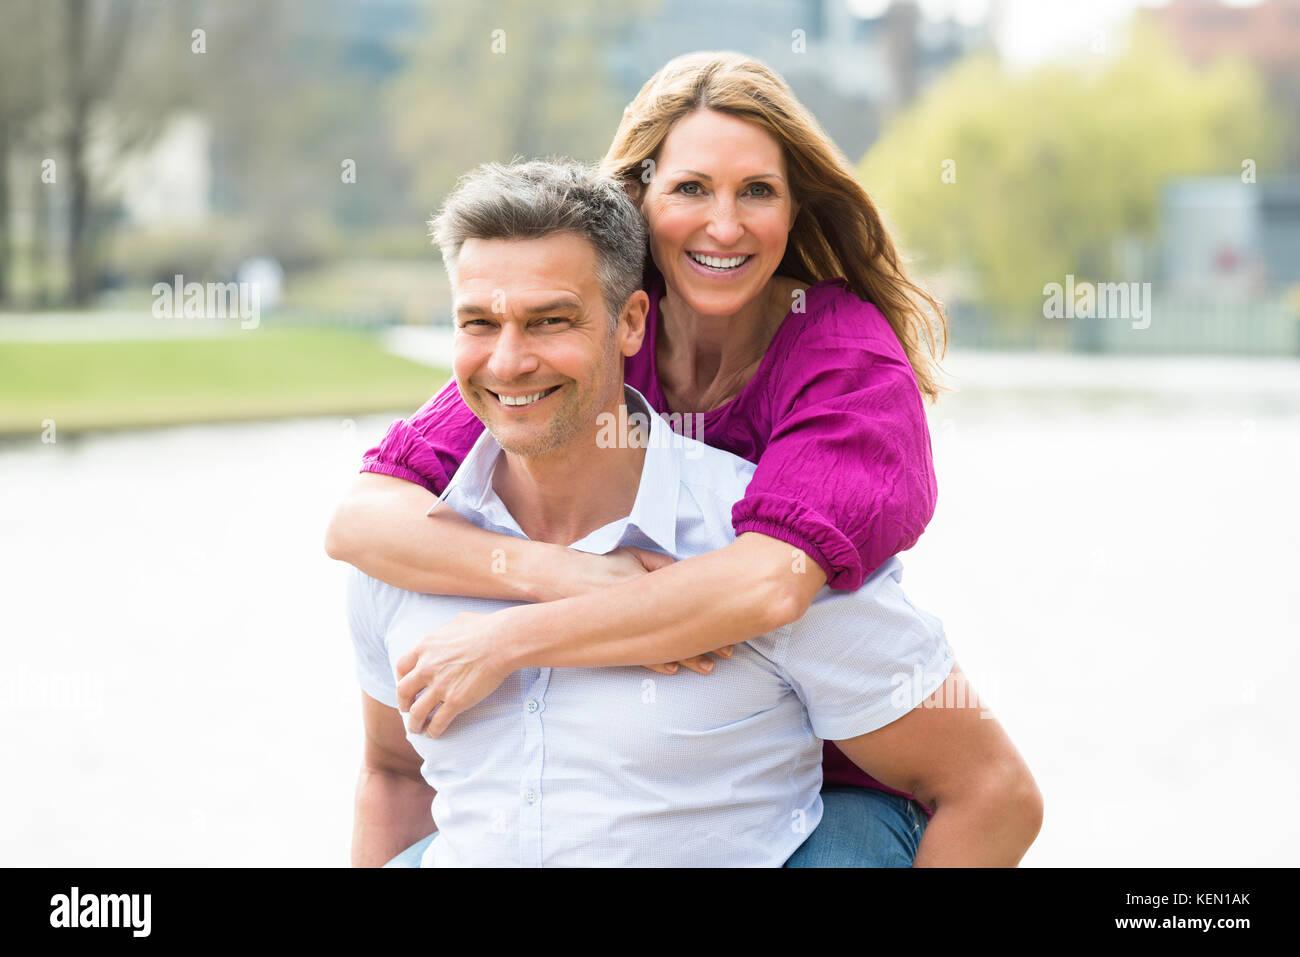 Portrait Of Happy Man Piggybacking His Wife - Stock Image